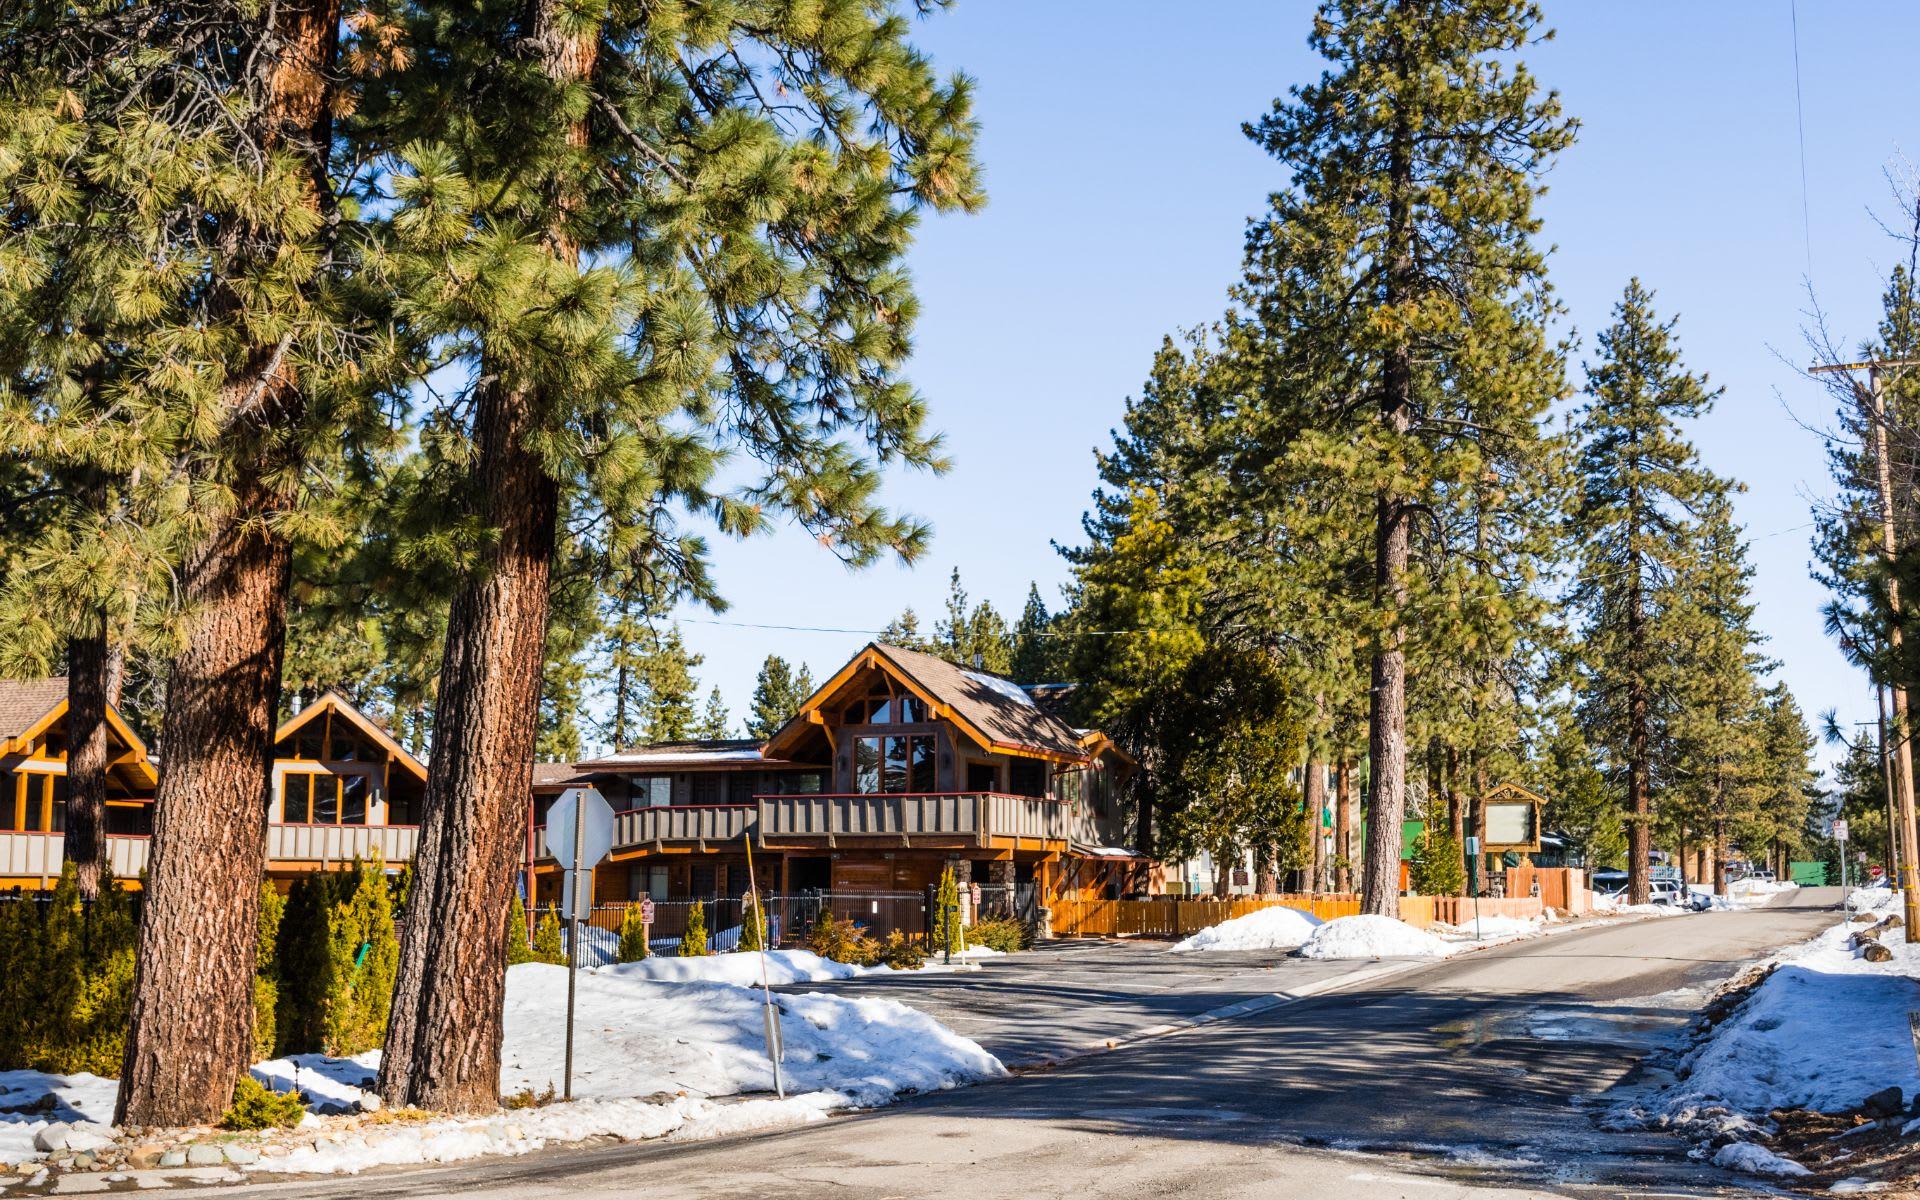 Premium Lakefront Property Sells for $24 Million